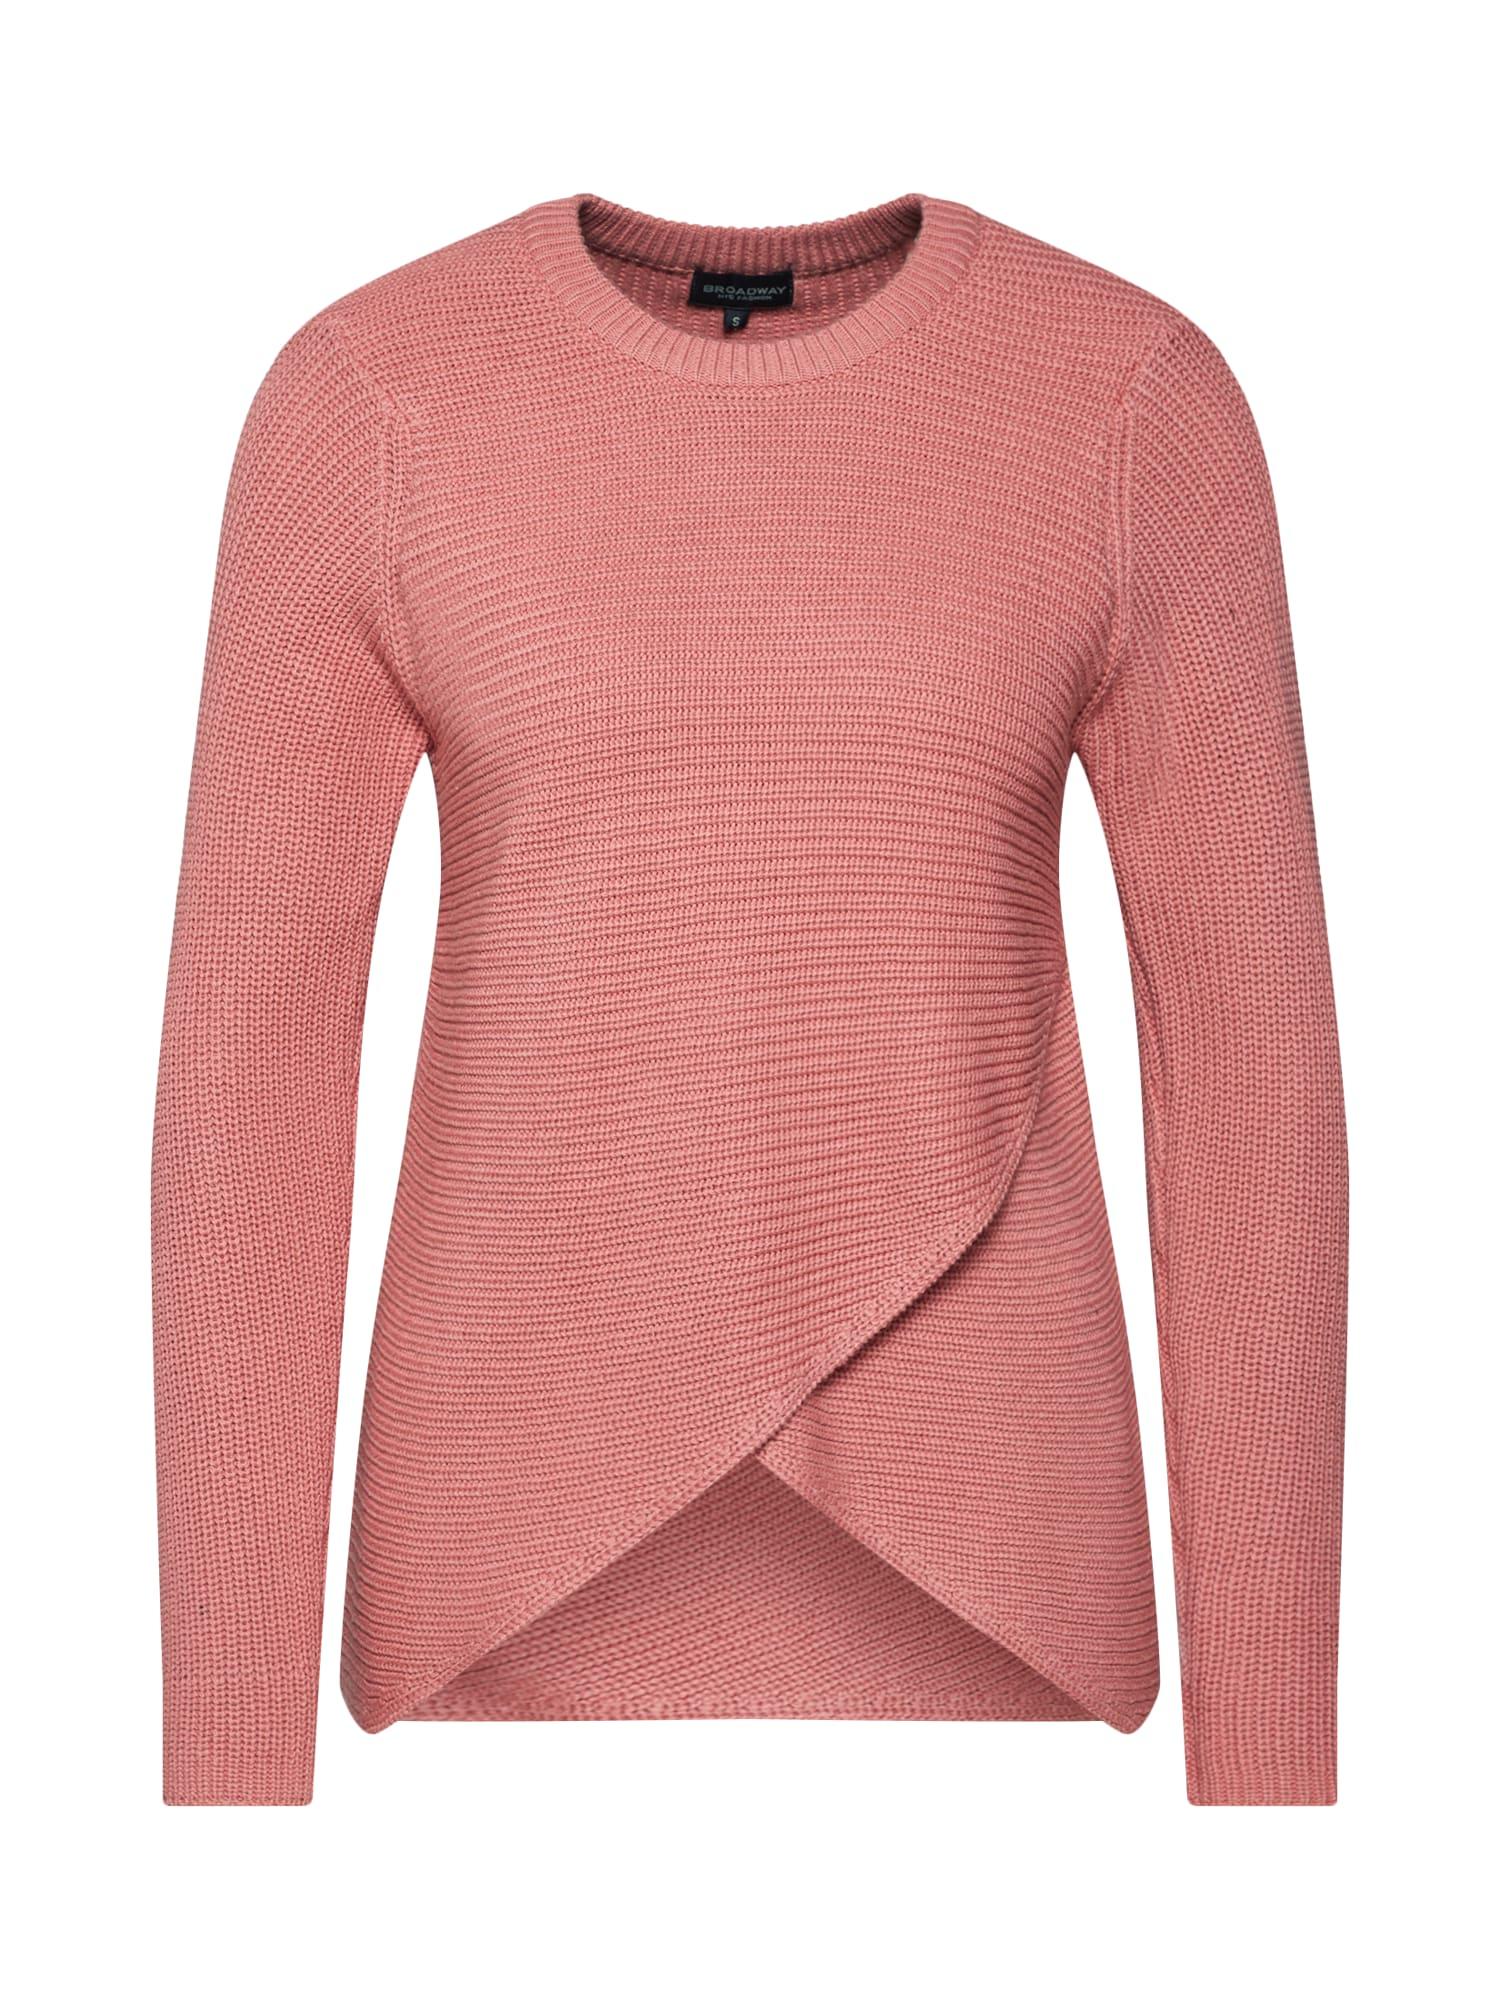 Maxi svetr Sweater Kora starorůžová BROADWAY NYC FASHION